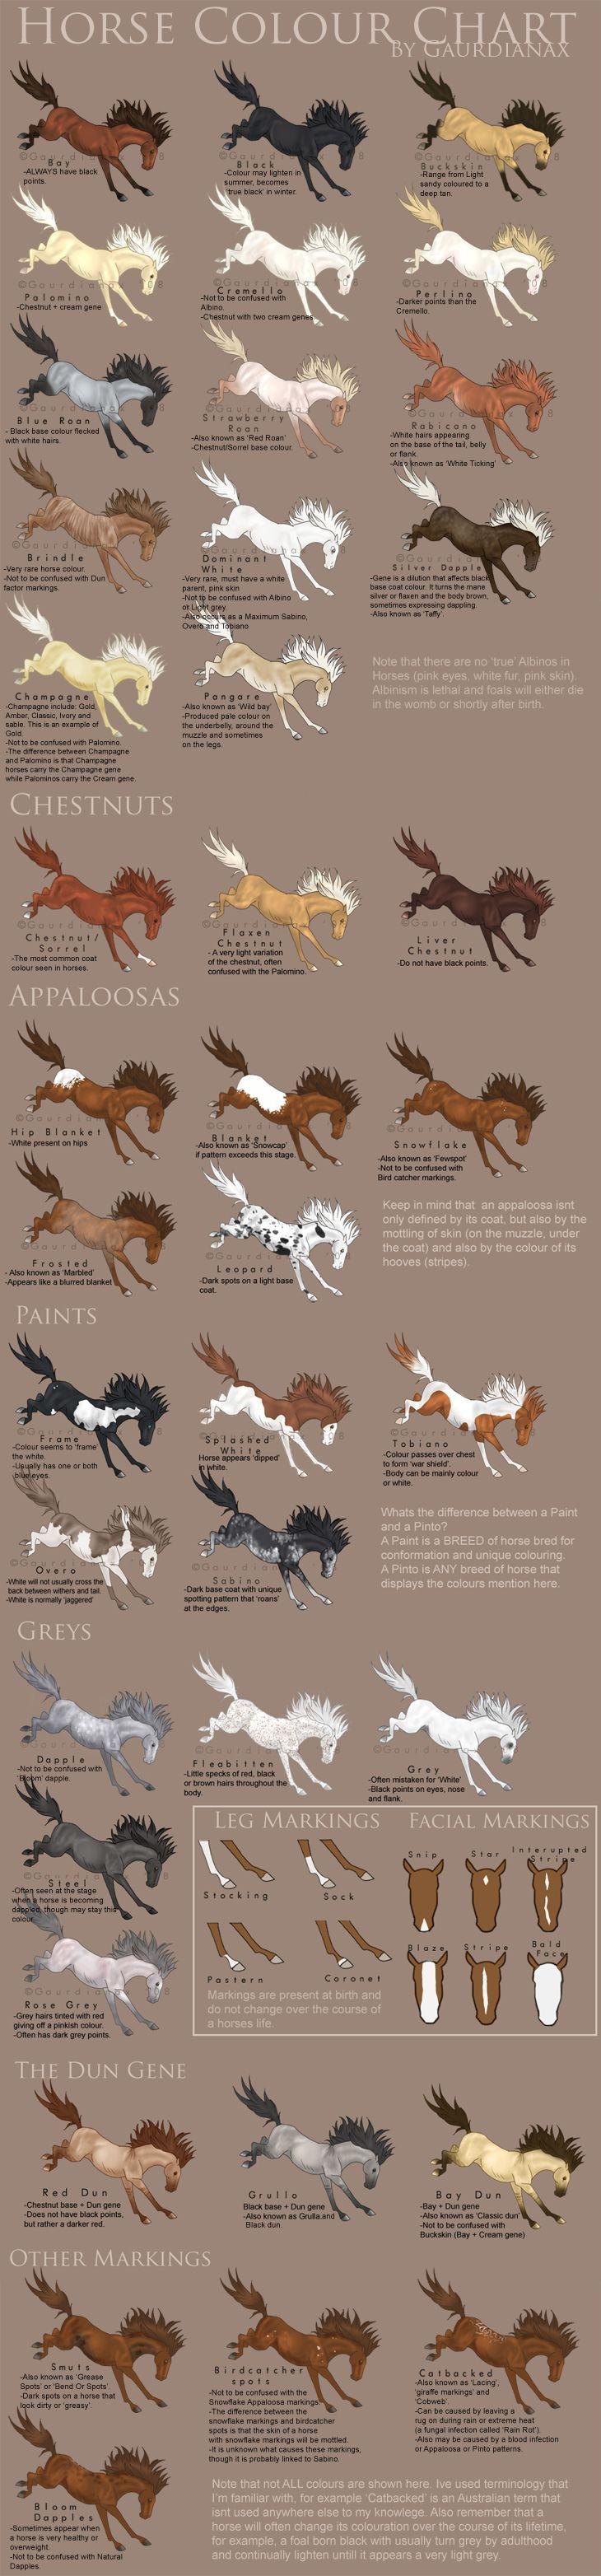 Horse Colour Chart vs 2 by Gaurdianax on deviantART